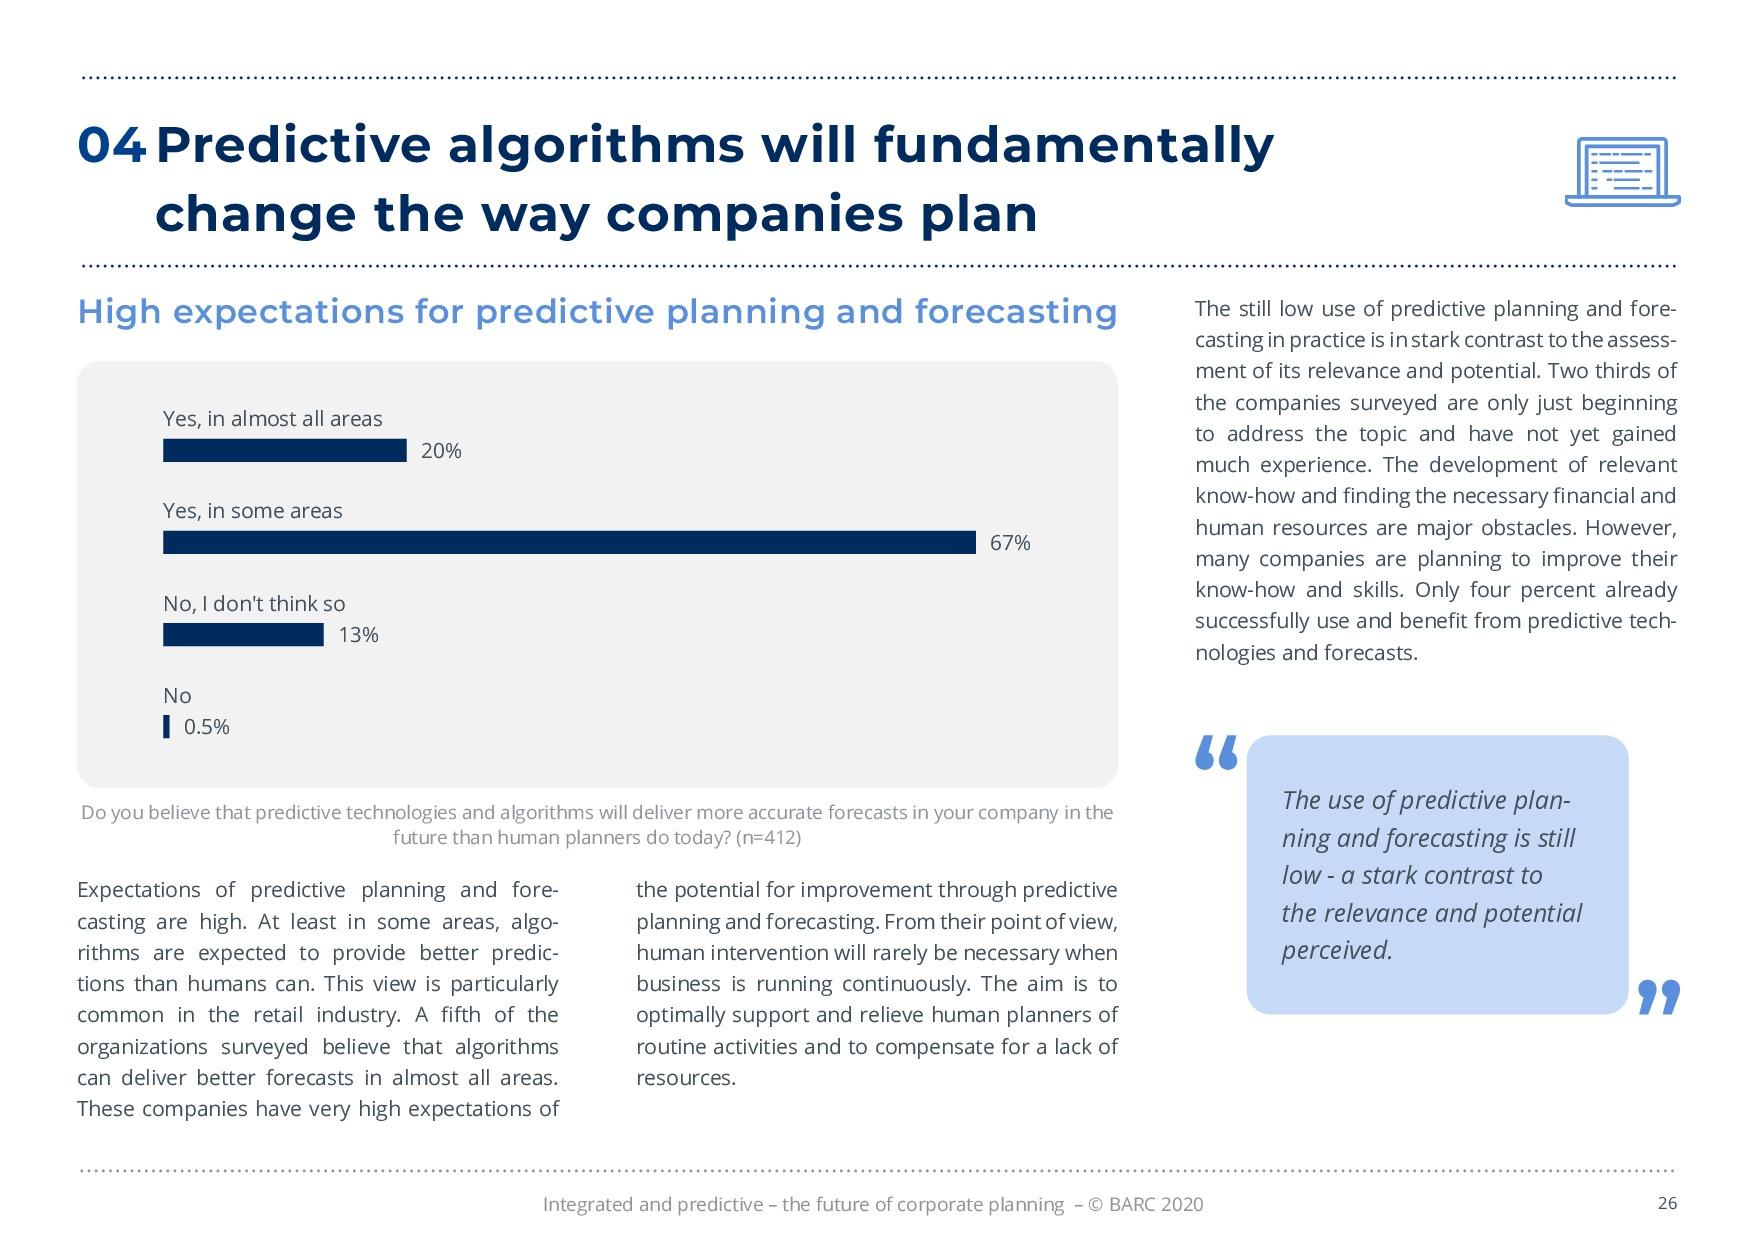 BARC – 統合と予測 – 経営計画の未来 | Page 26